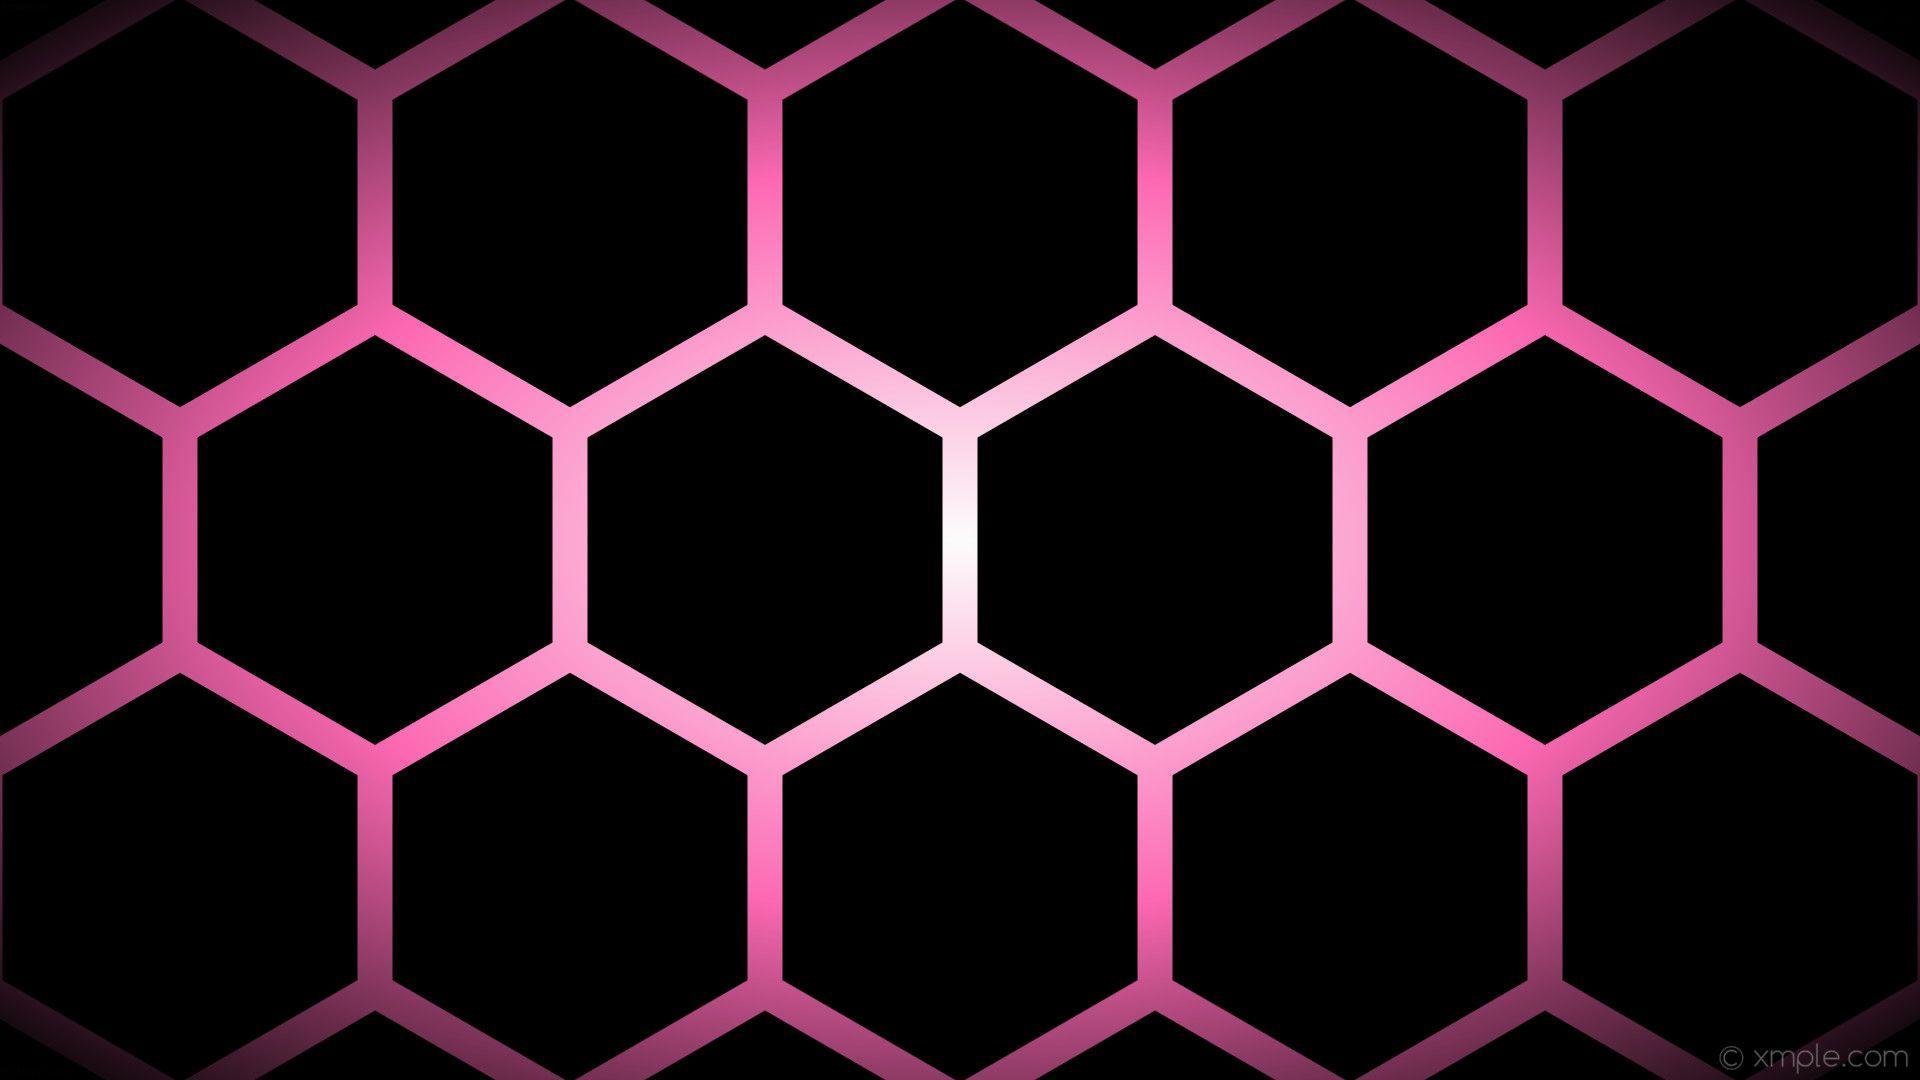 Wallpapers Black Pink - Wallpaper Cave